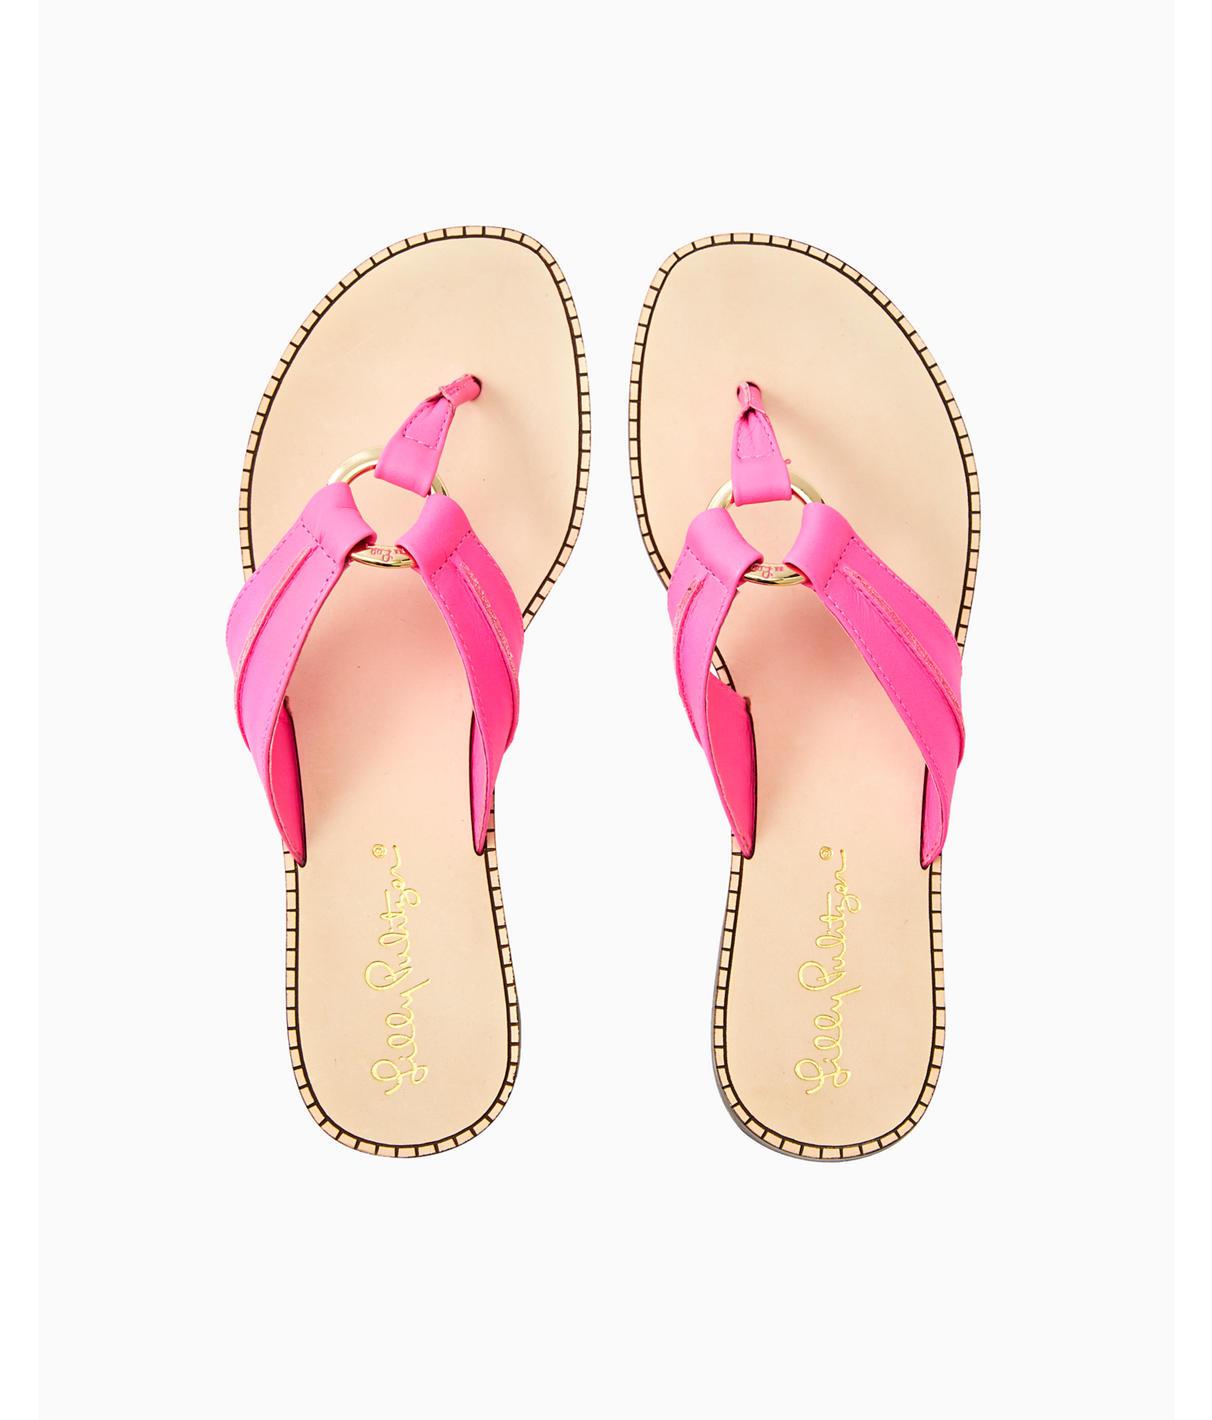 Lilly Pulitzer Womens Mckim Leather Sandal In True Navy